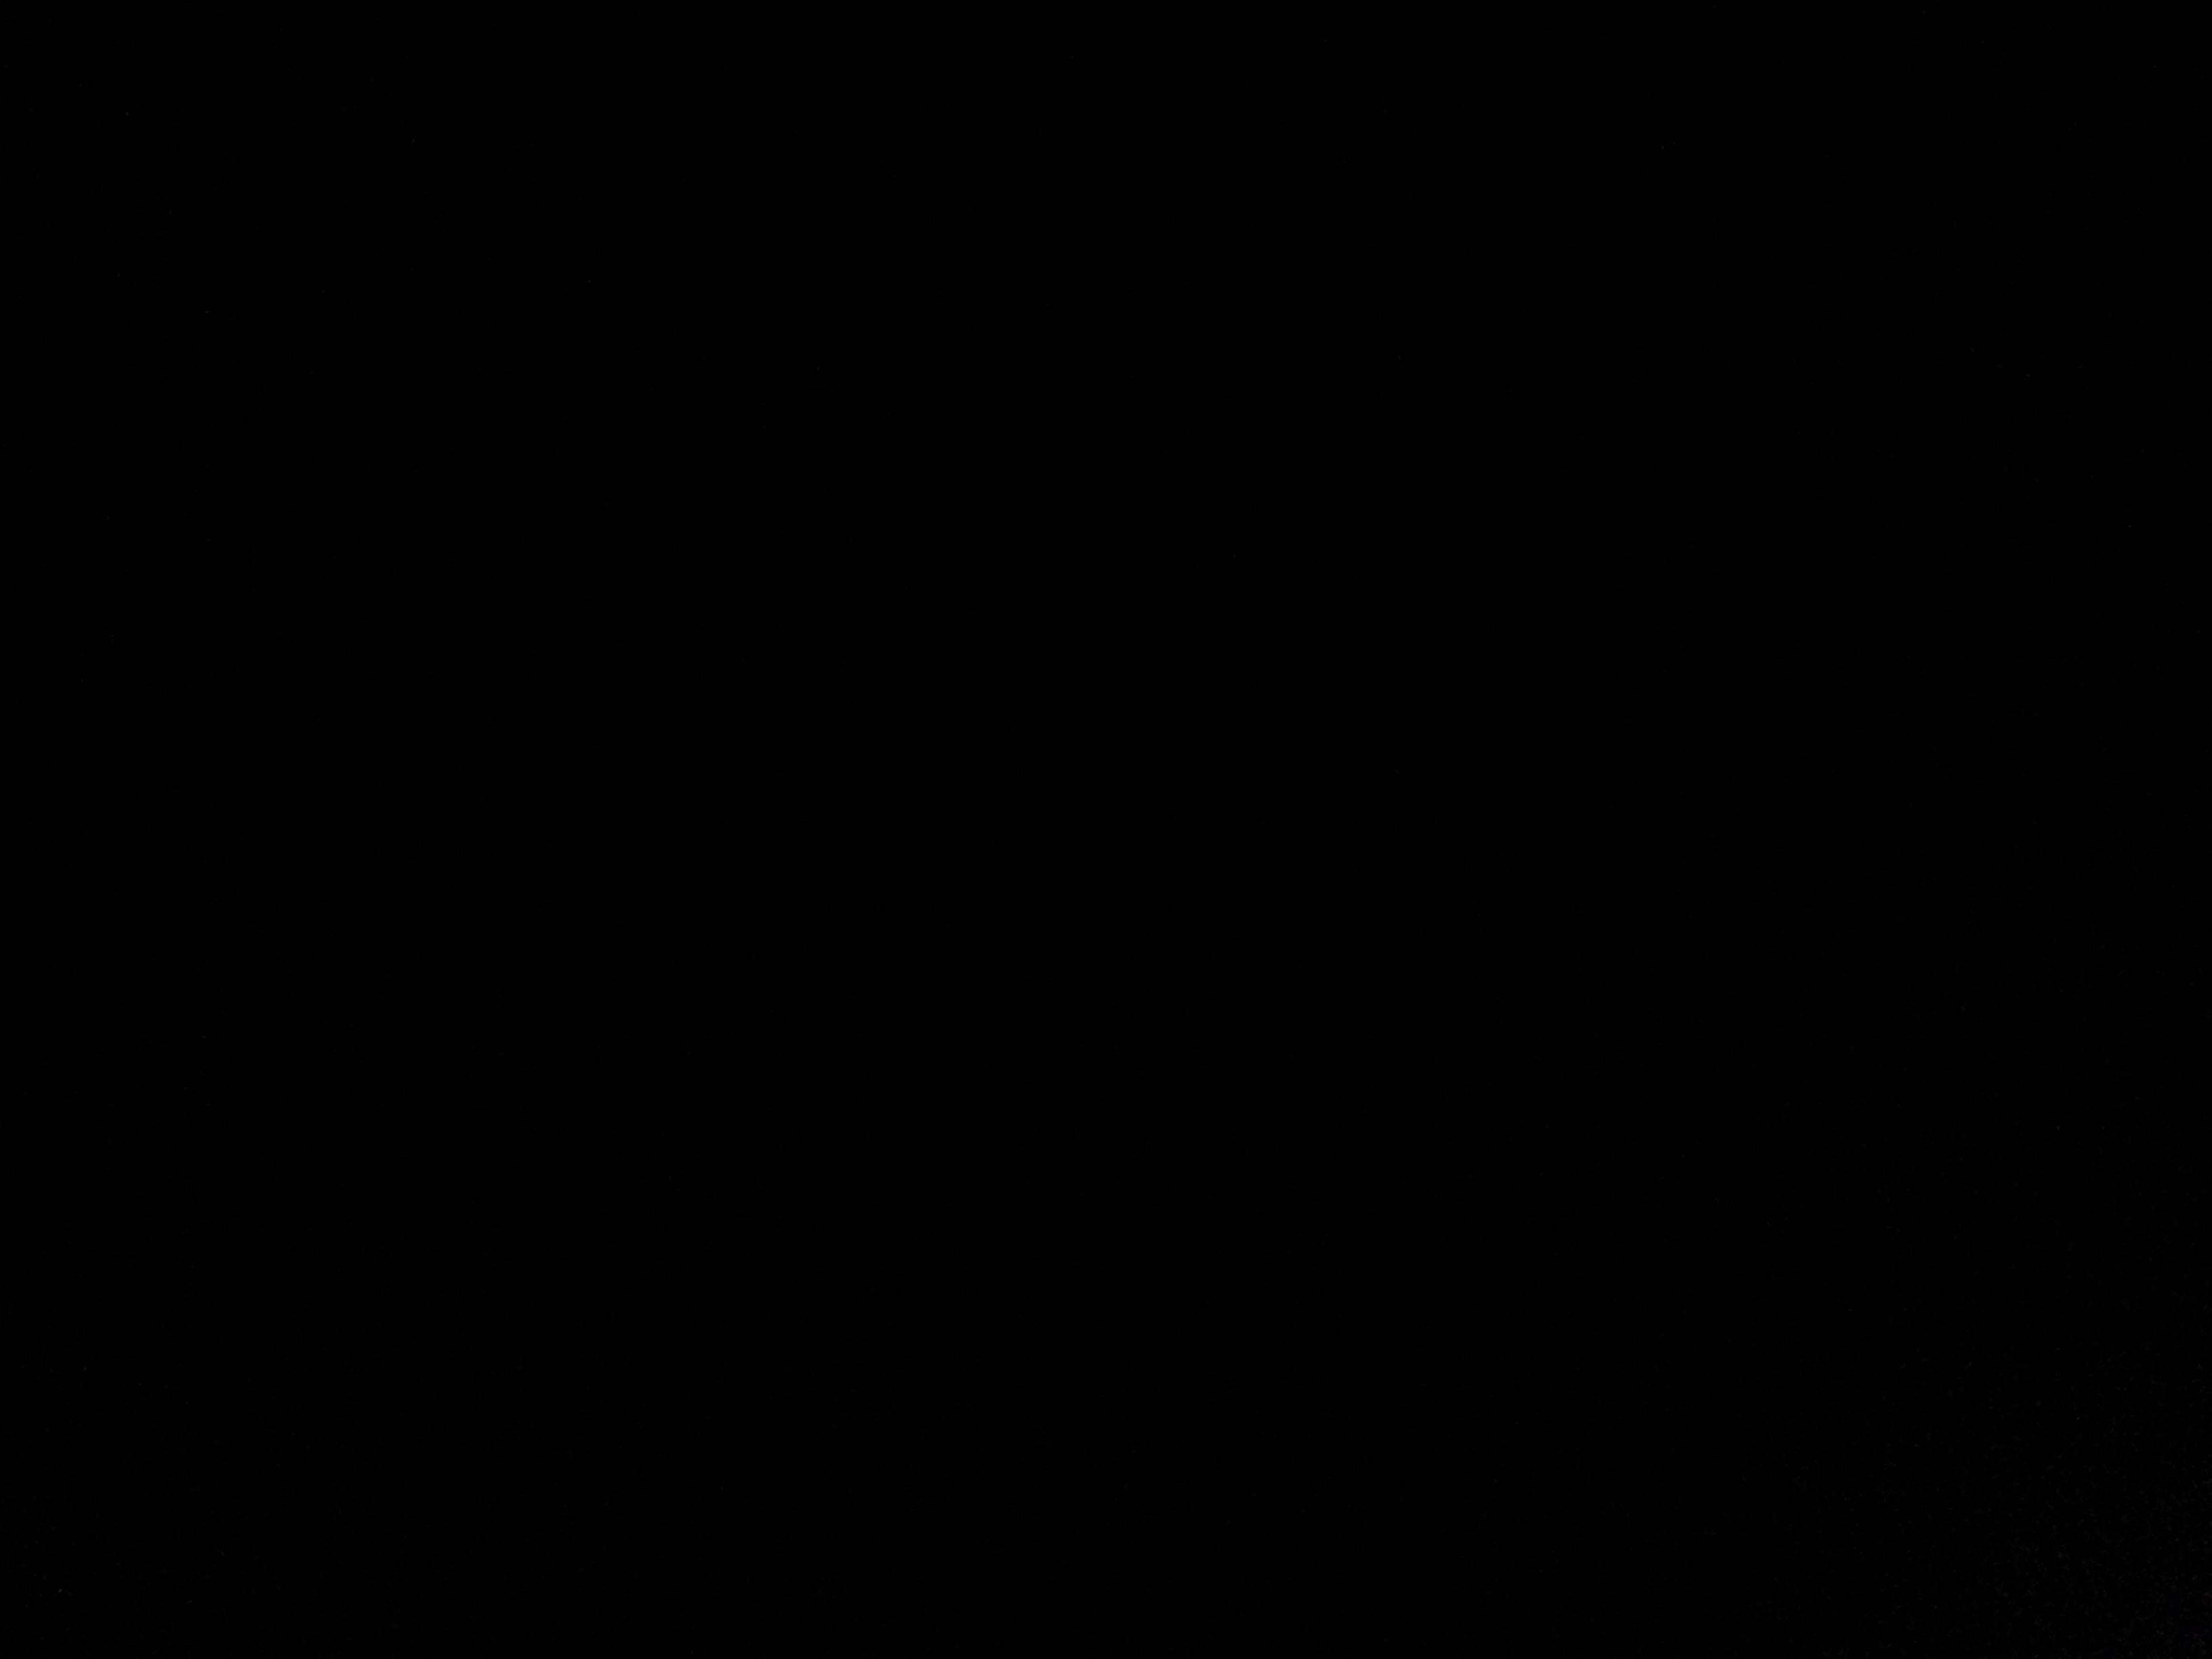 Unduh 1000+ Wallpaper Black Only HD Terbaik